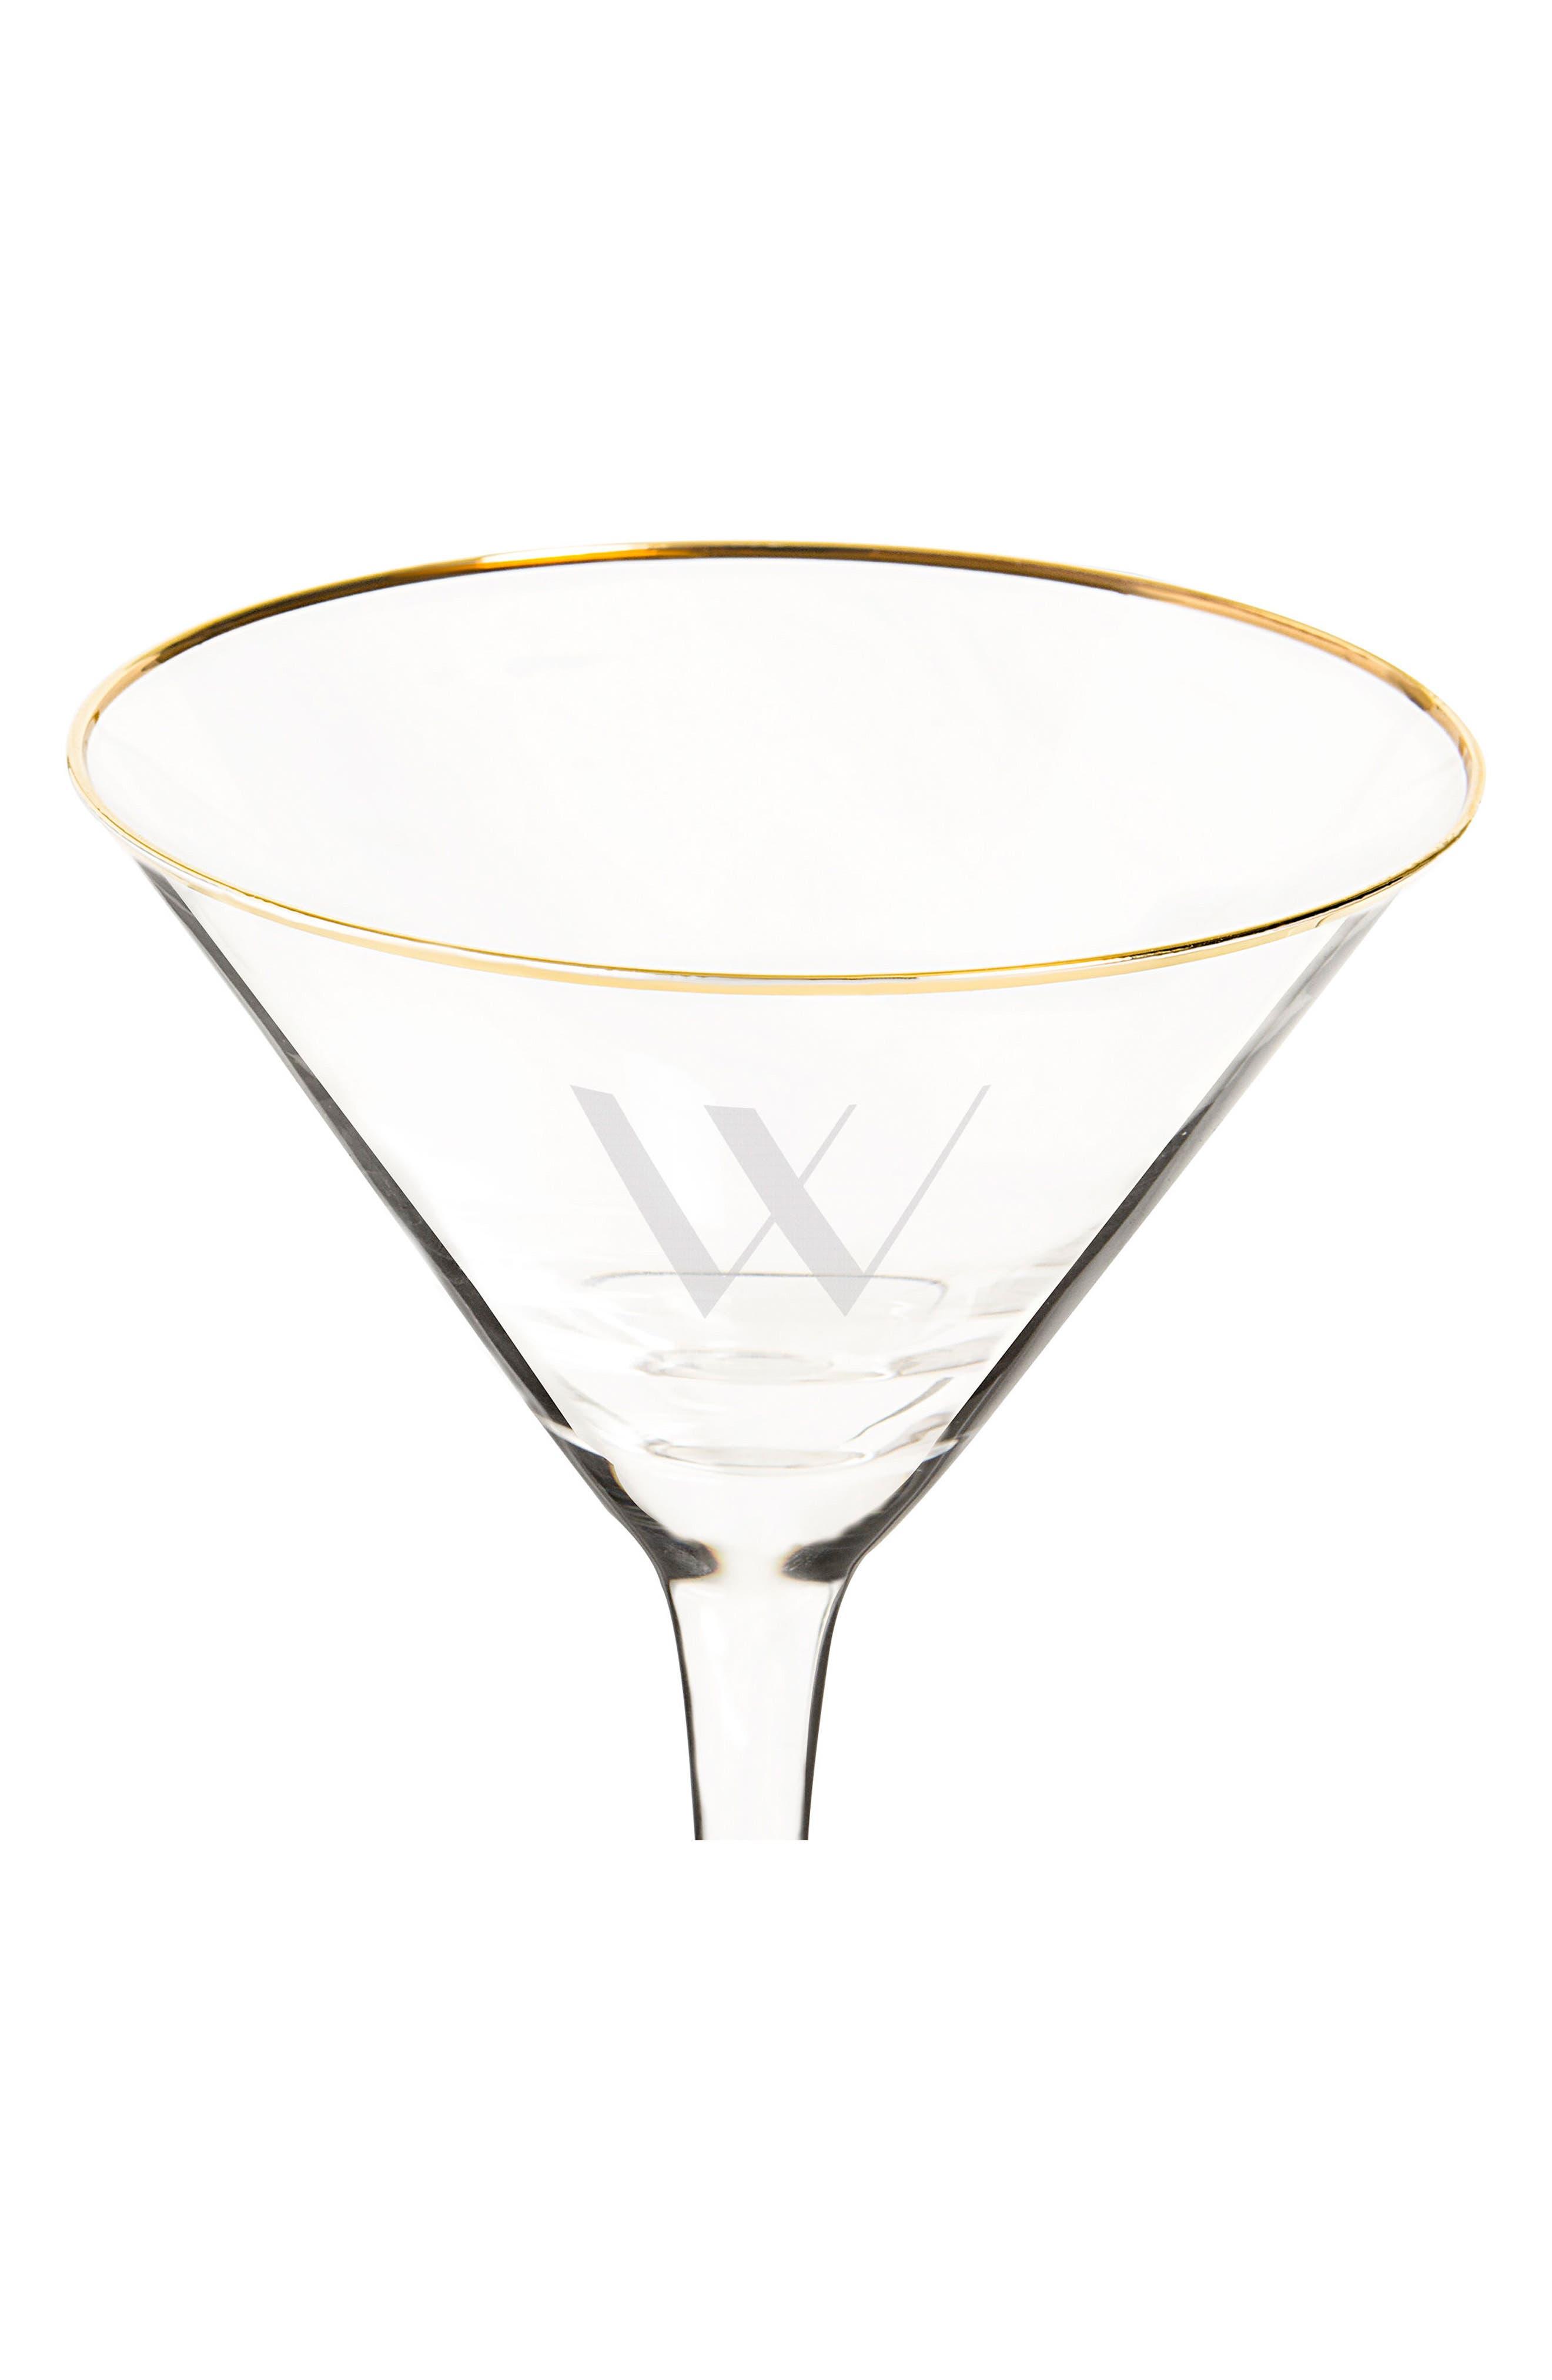 Monogram Martini Glasses & Goldtone Cocktail Shaker,                             Alternate thumbnail 4, color,